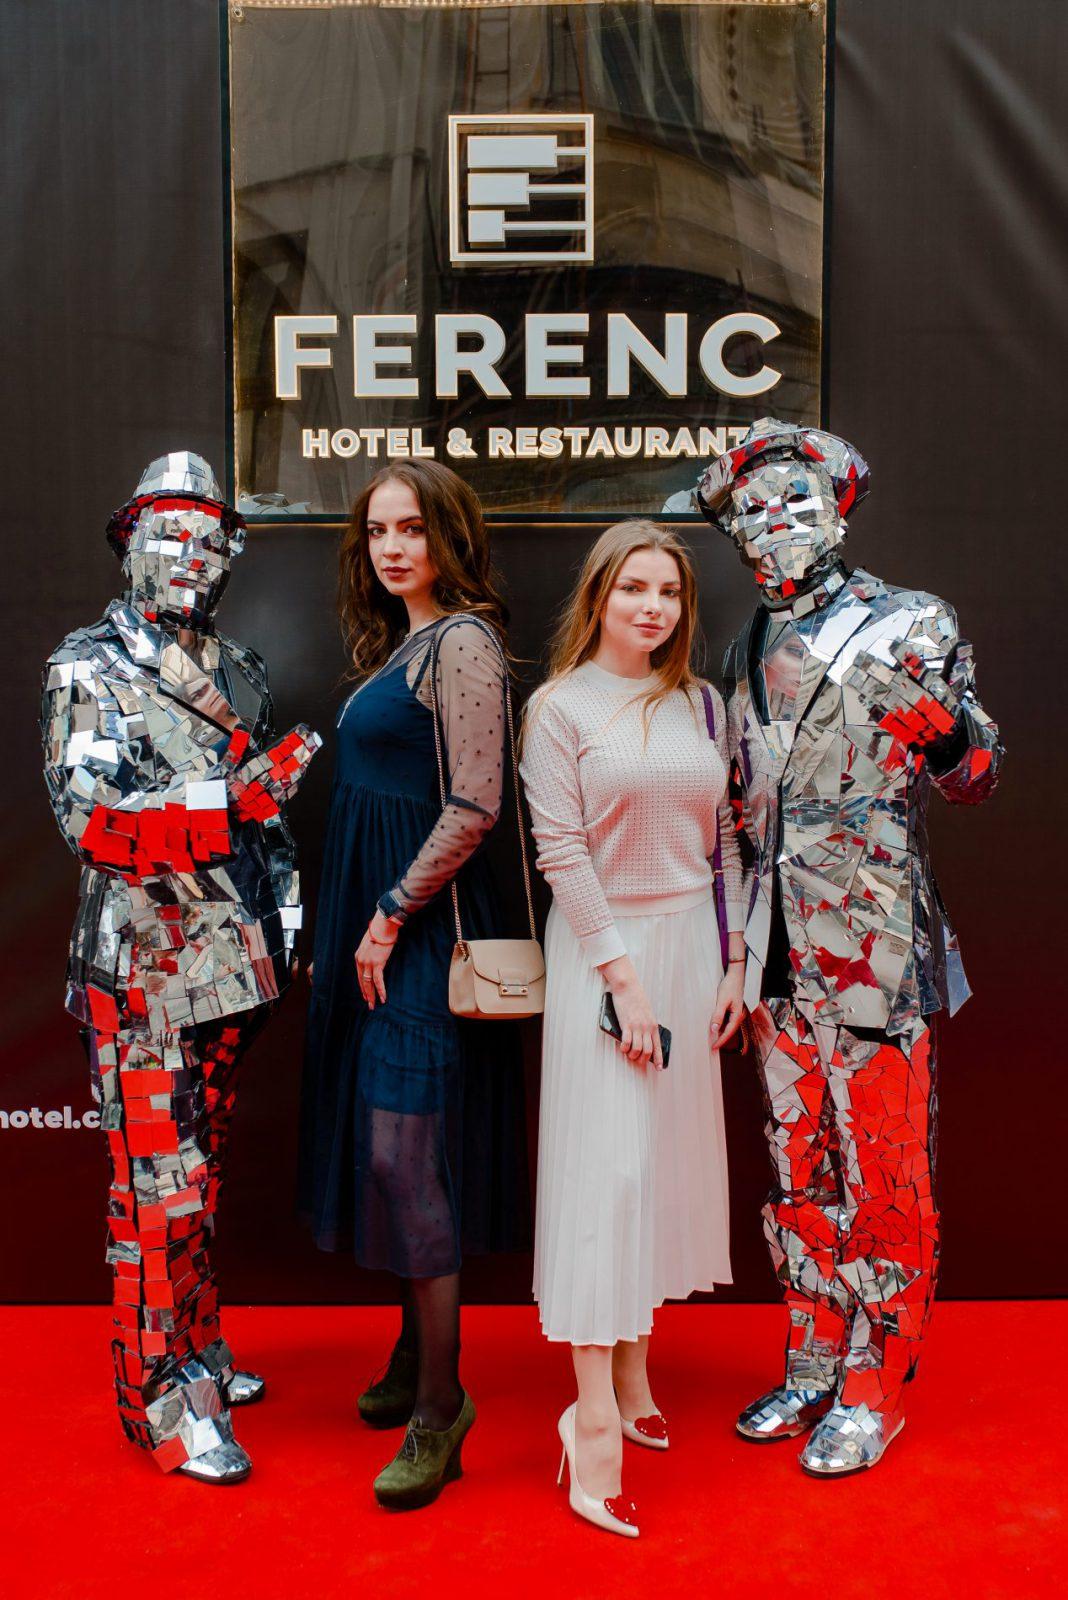 Ferenc0108